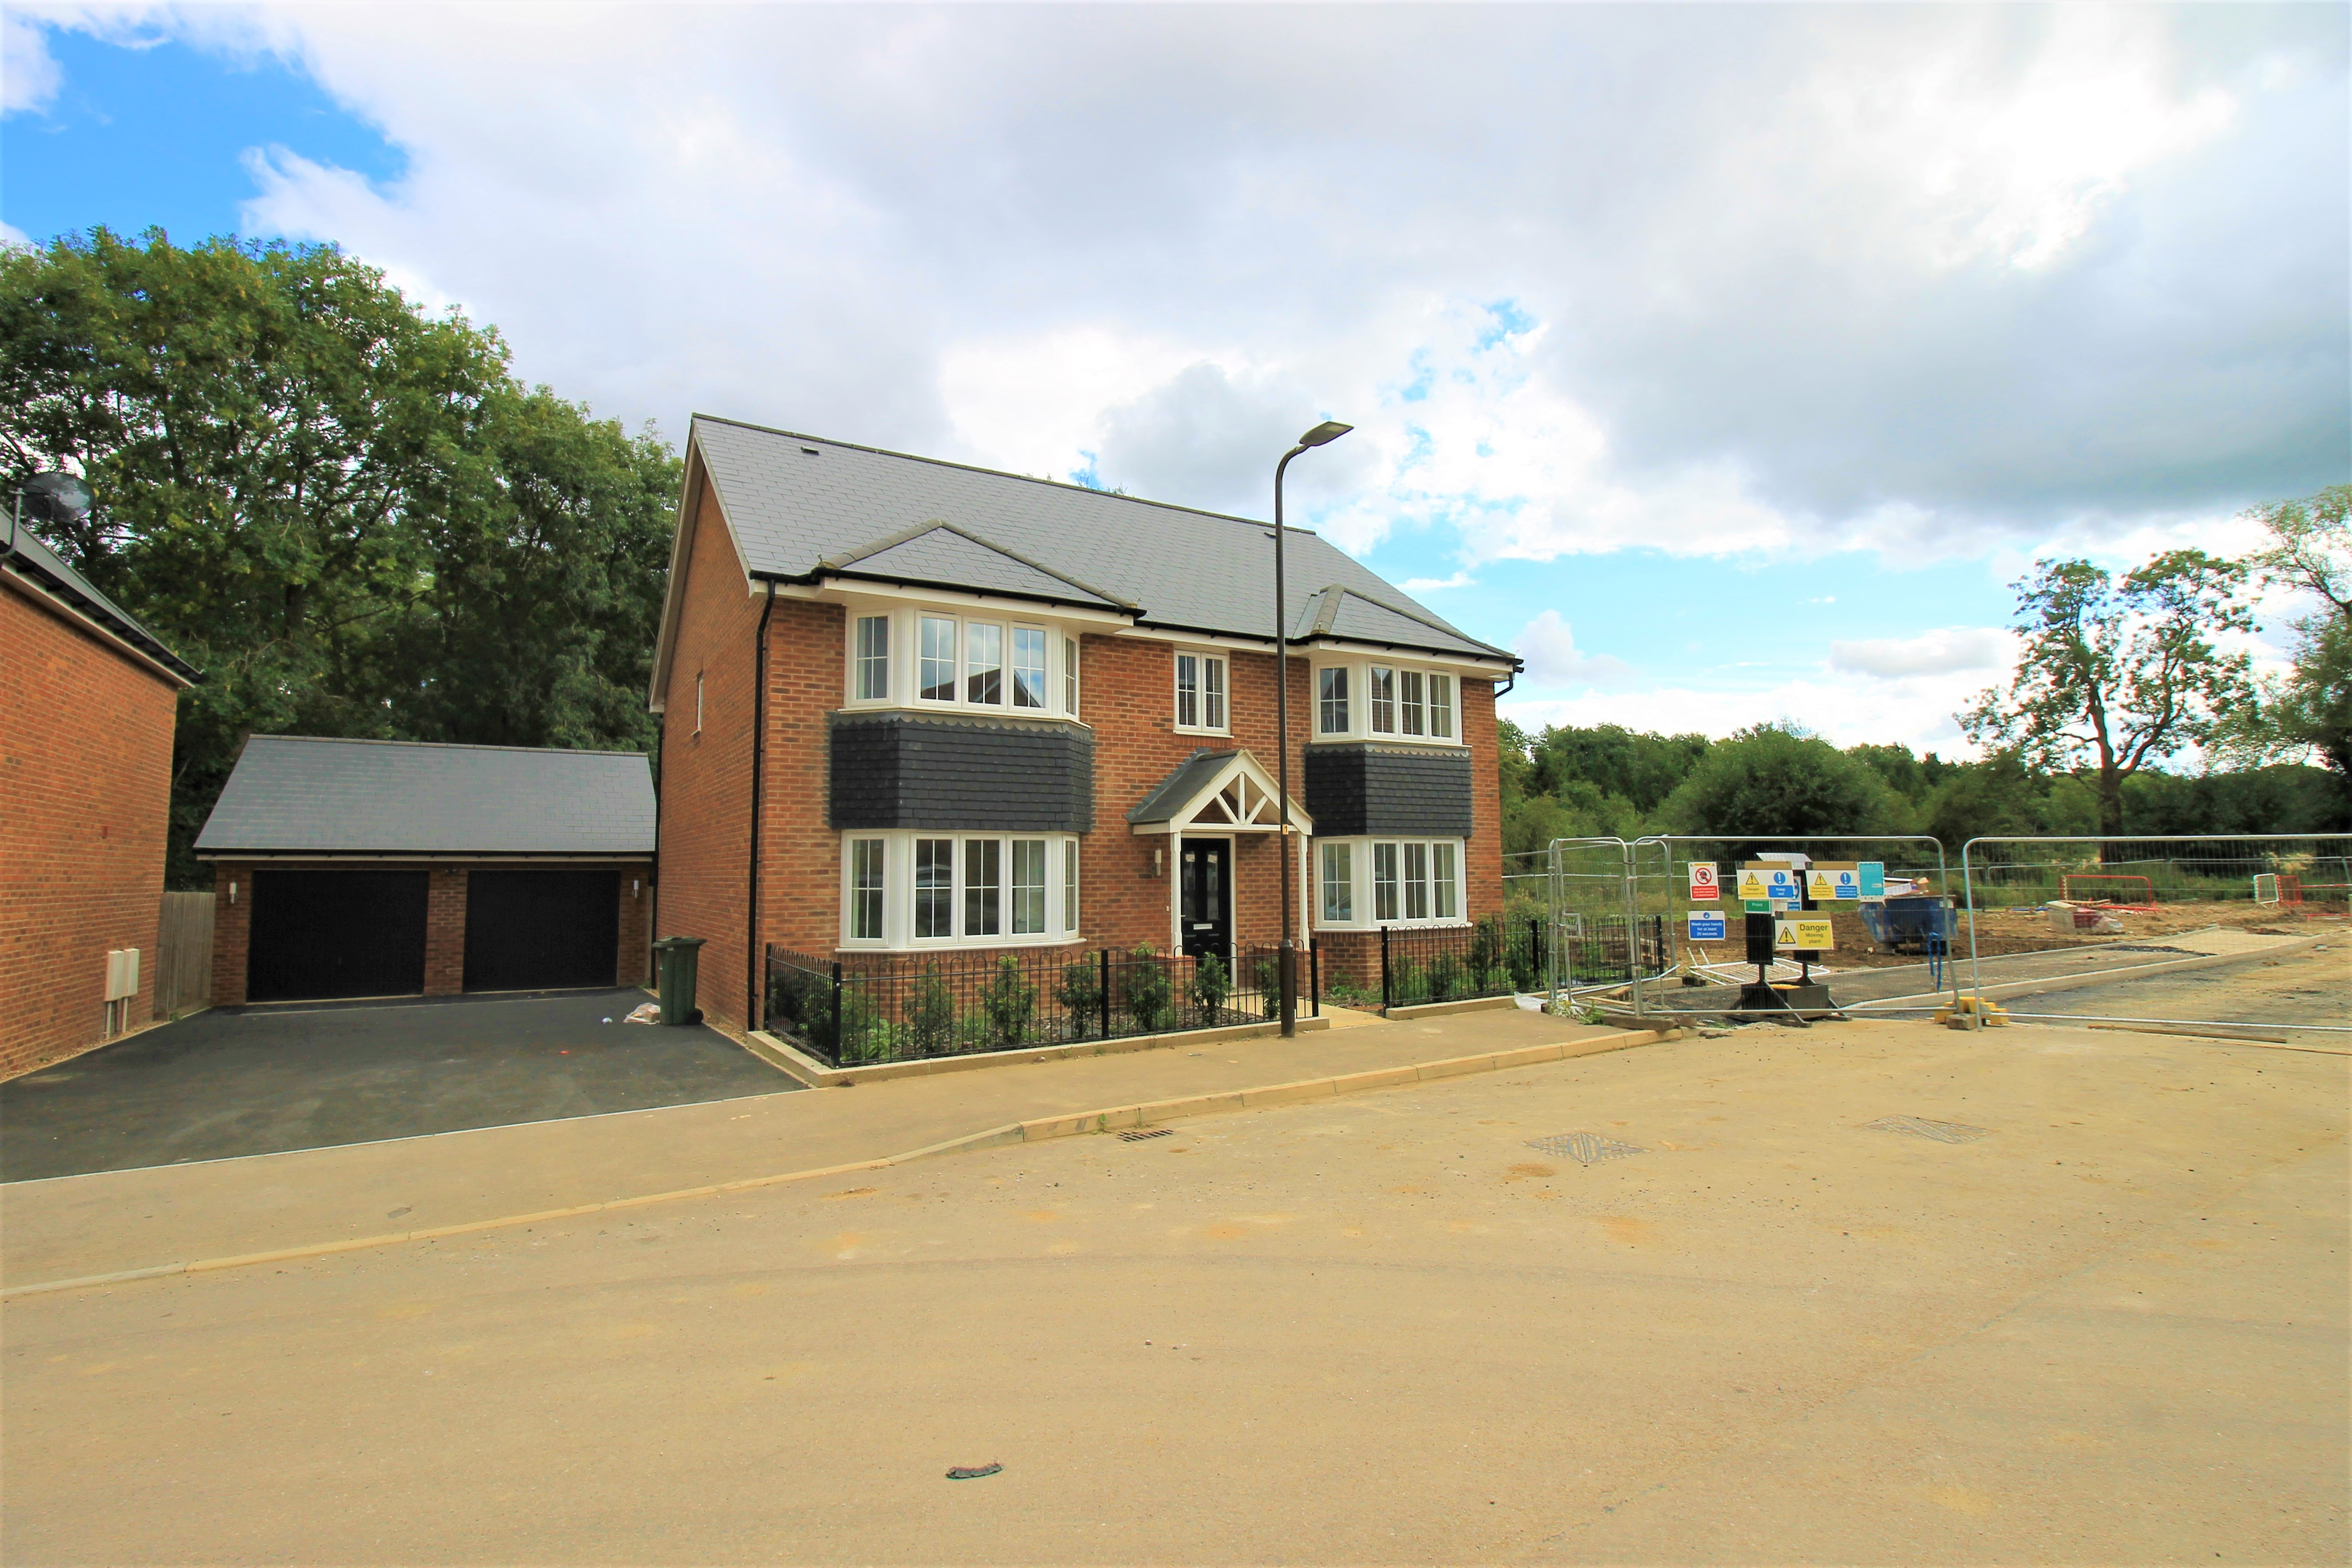 Limousin Avenue, Milton Keynes, Buckinghamshire Image